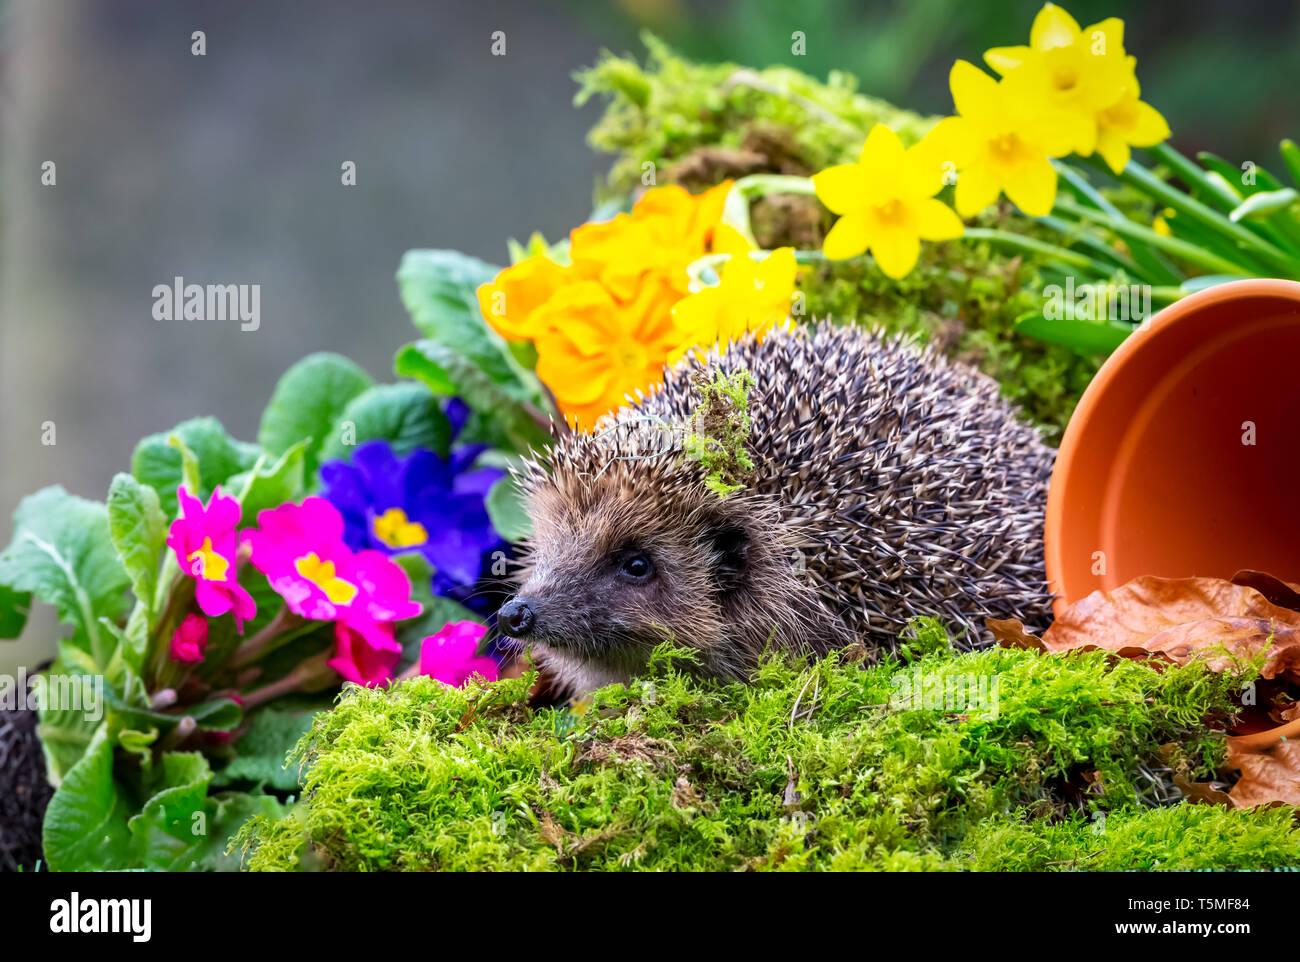 Hedgehog, (Erinaceus Europaeus) wild, native, European hedgehog in Springtime with colourful spring flowers, grass and plant pot. Landscape. copyspace - Stock Image